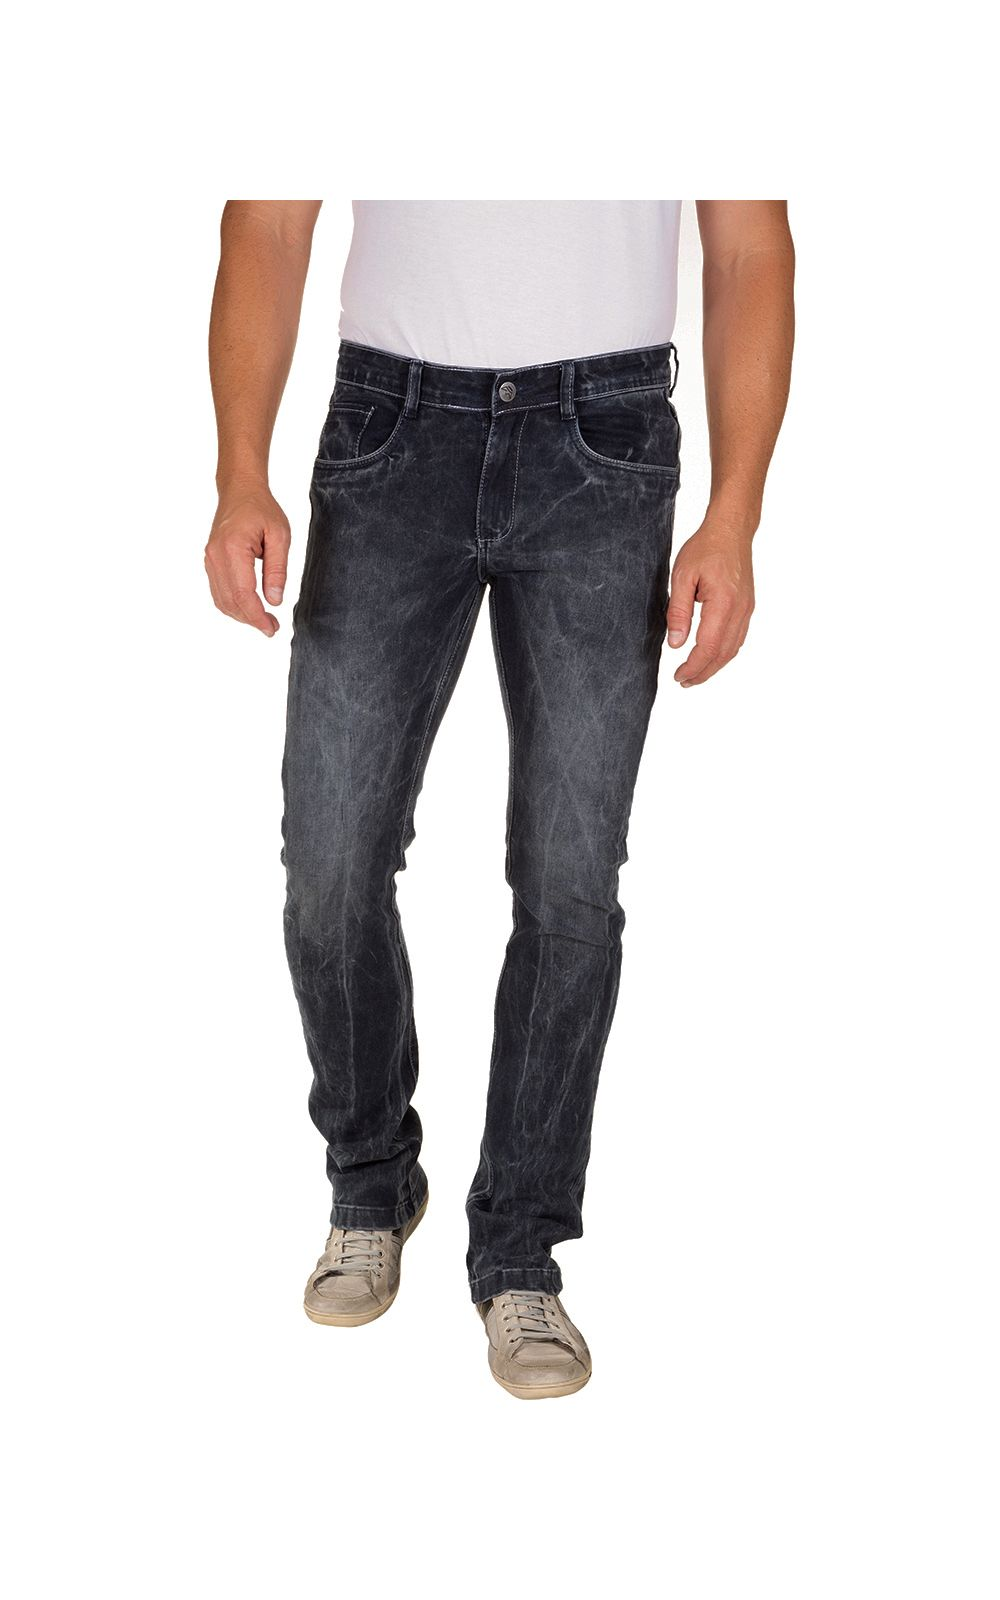 Foto 1 - Calça Jeans Masculina Preta Texturizada